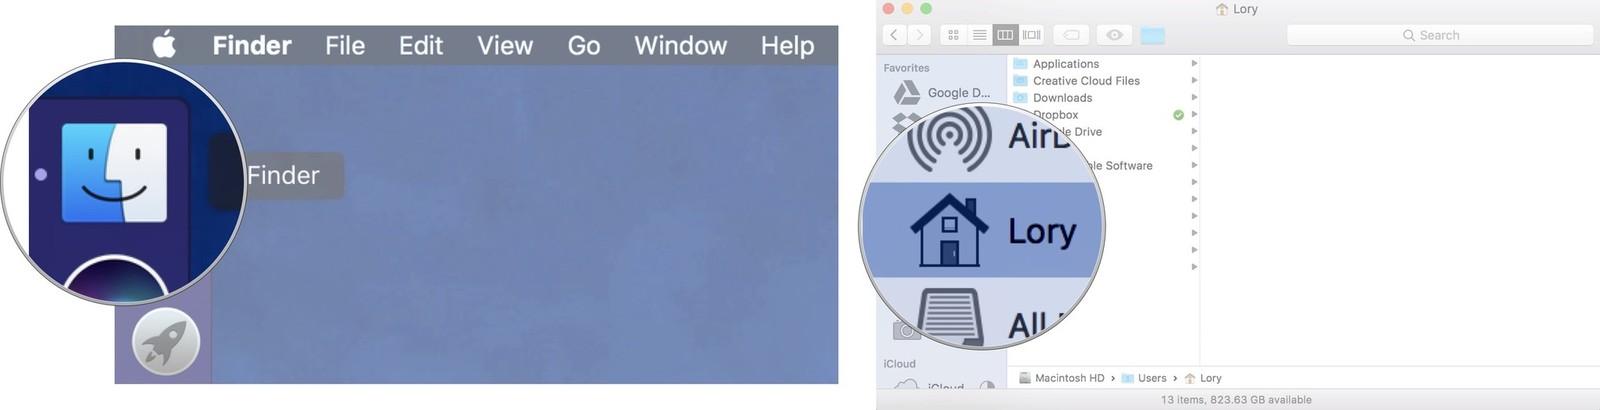 move itunes external hard drive open finder select local hard drive mac screenshot